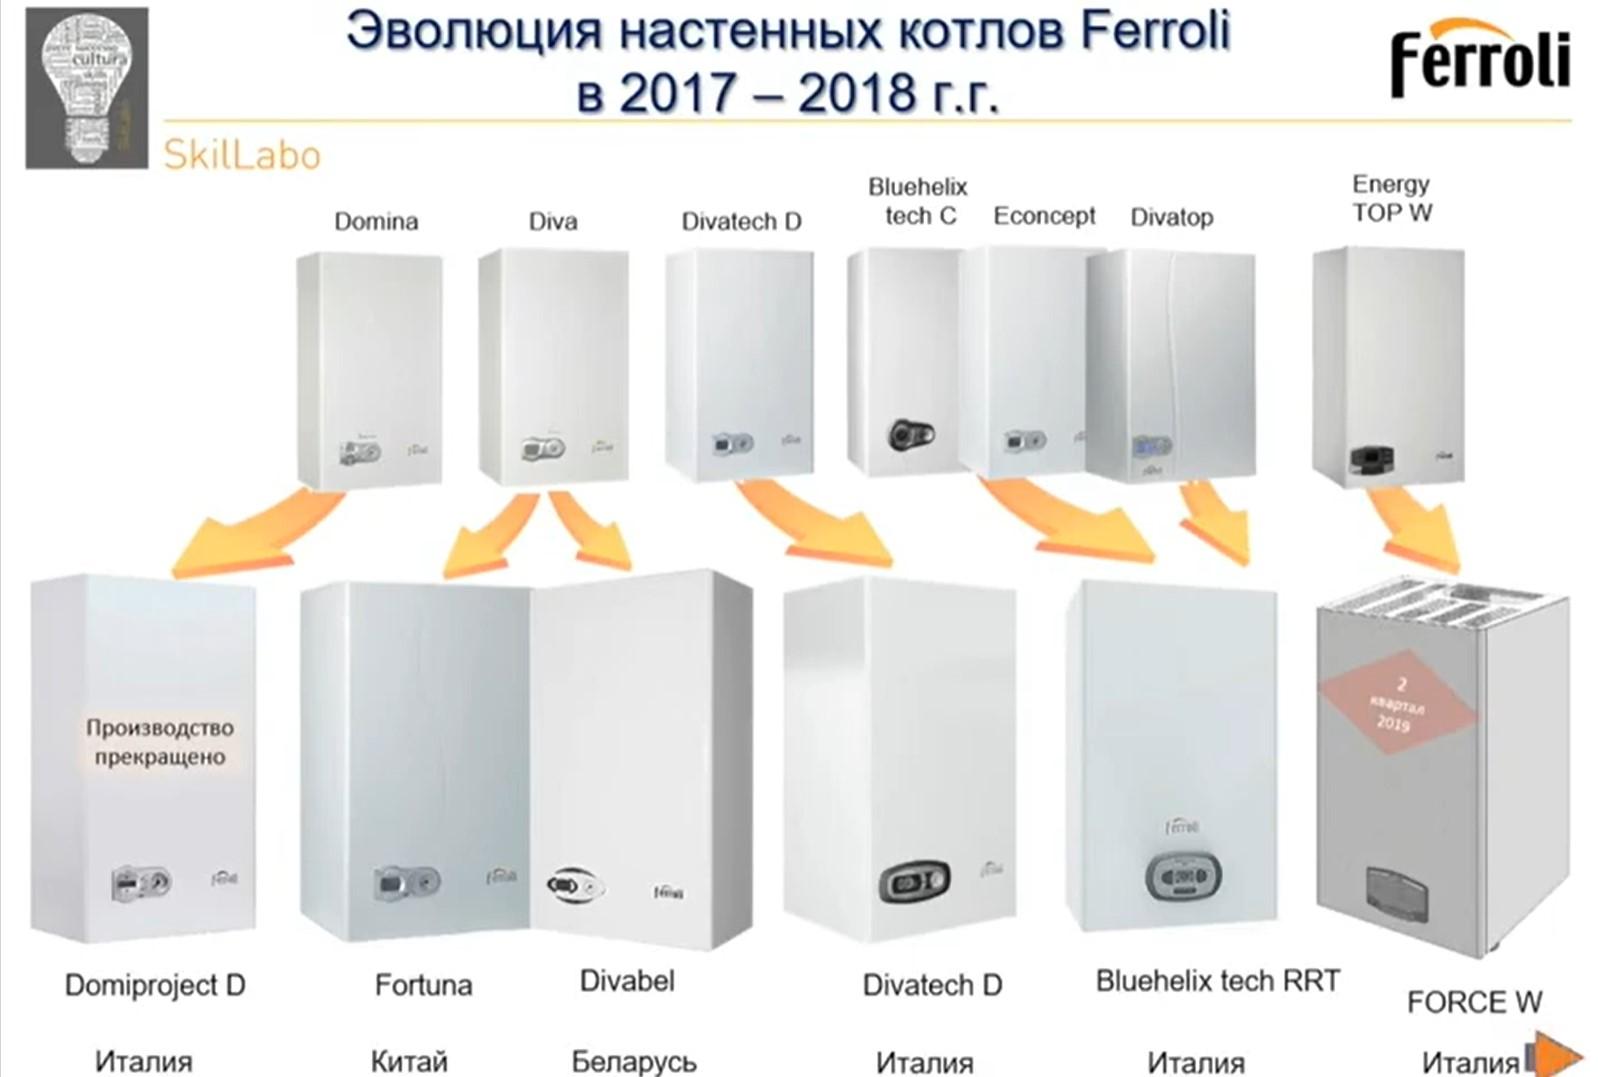 Эволюция котлов Ferroli